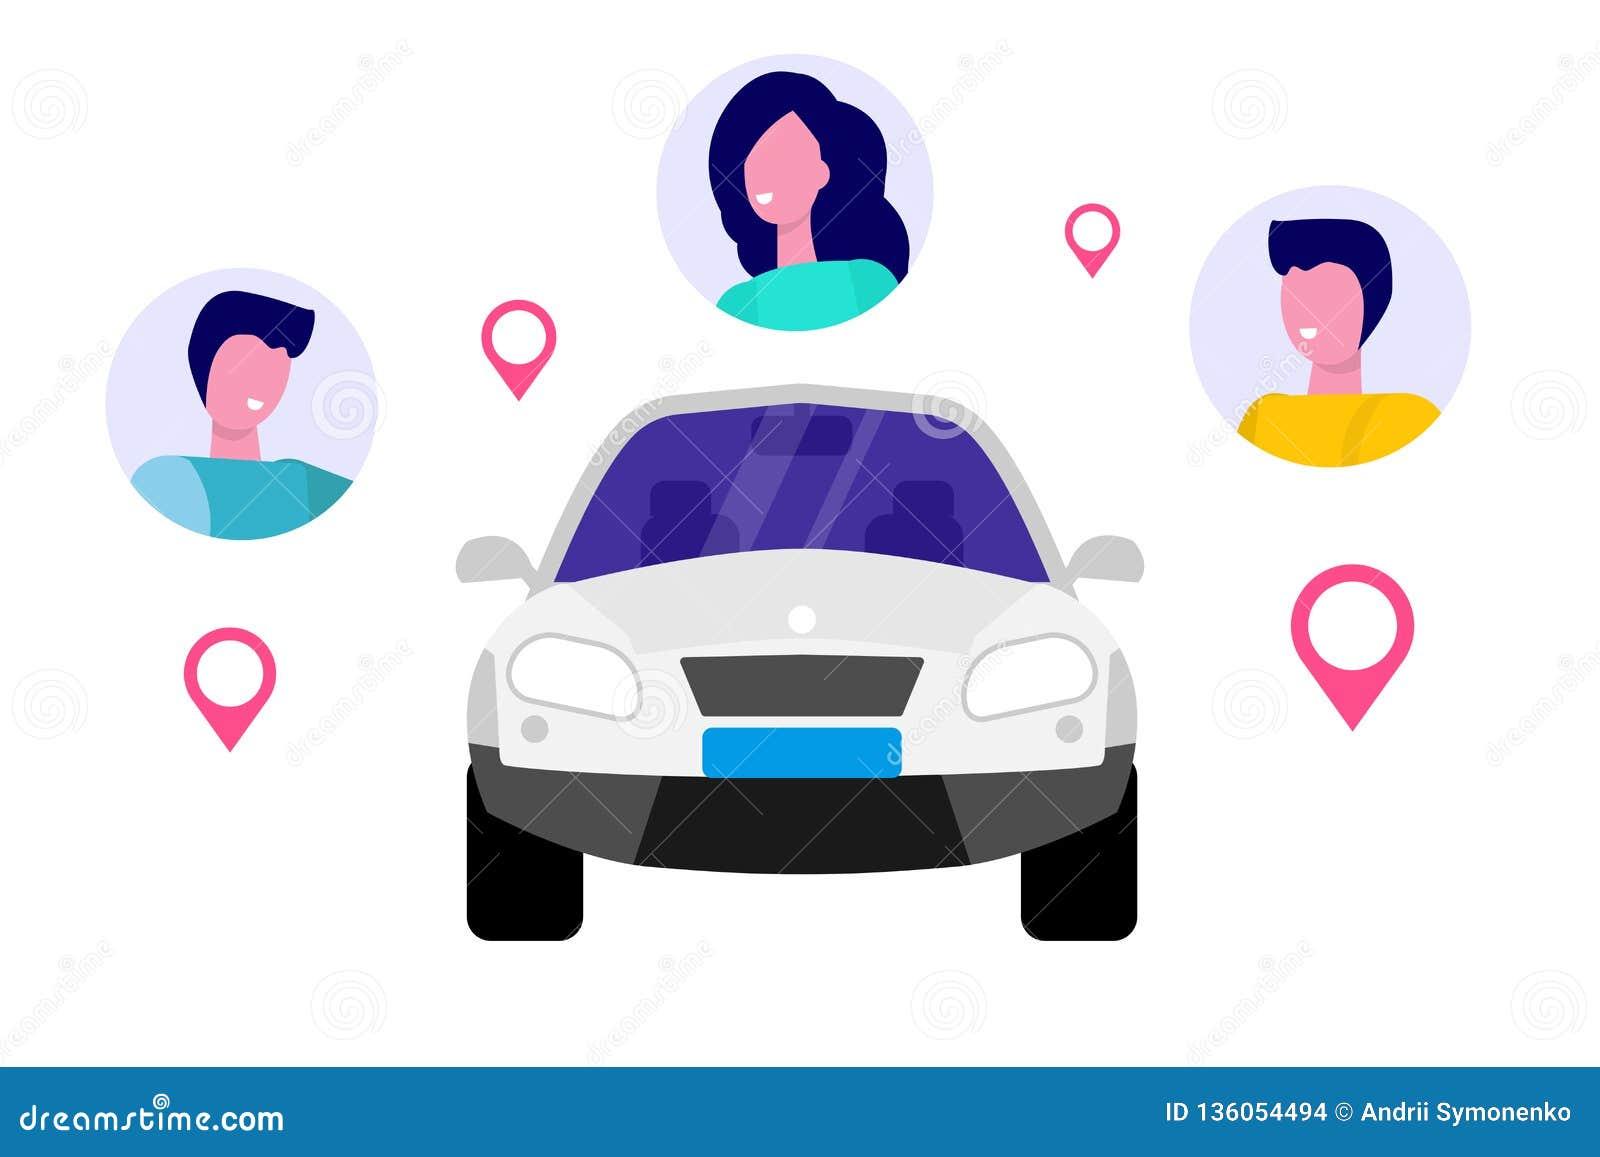 Car Sharing, Transport renting service concept.